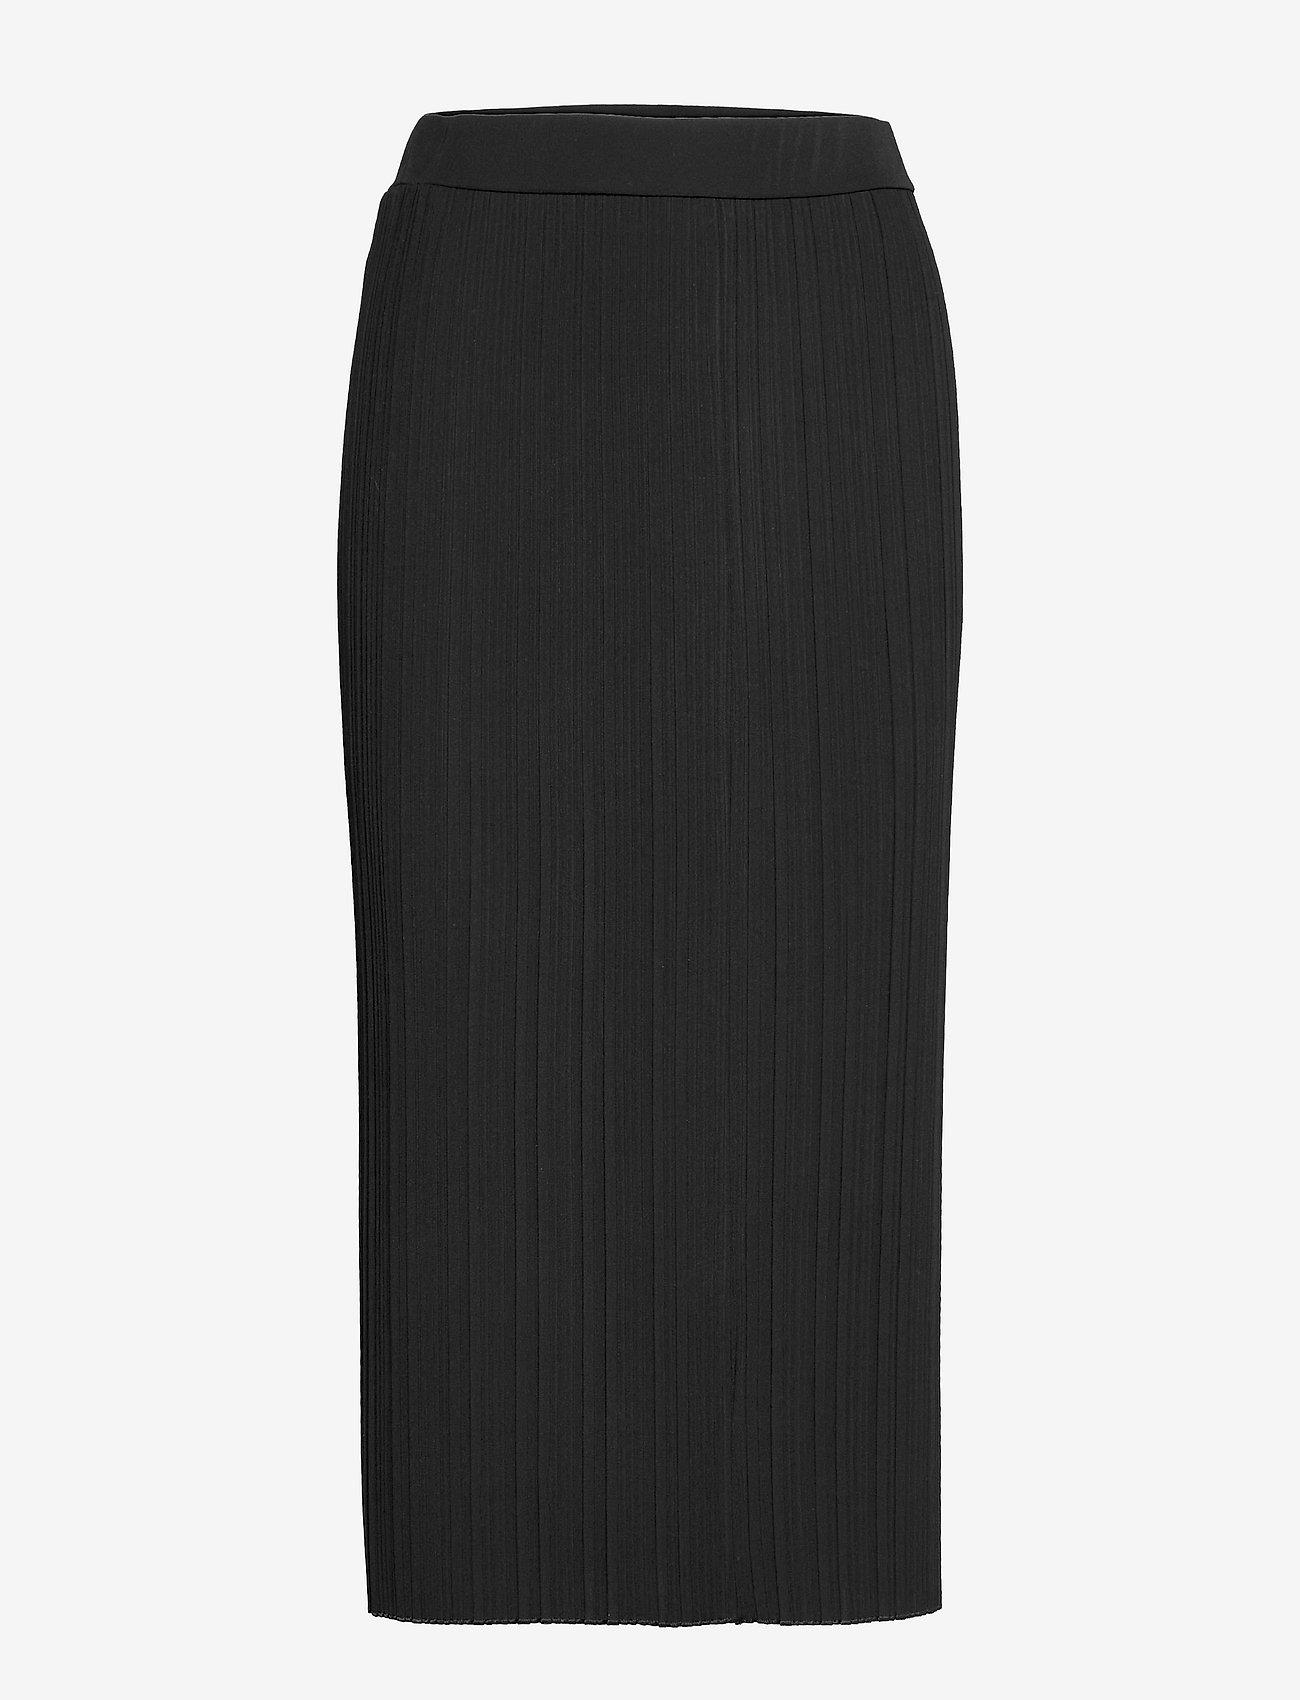 Max Mara Leisure - RARO - midi skirts - black - 0